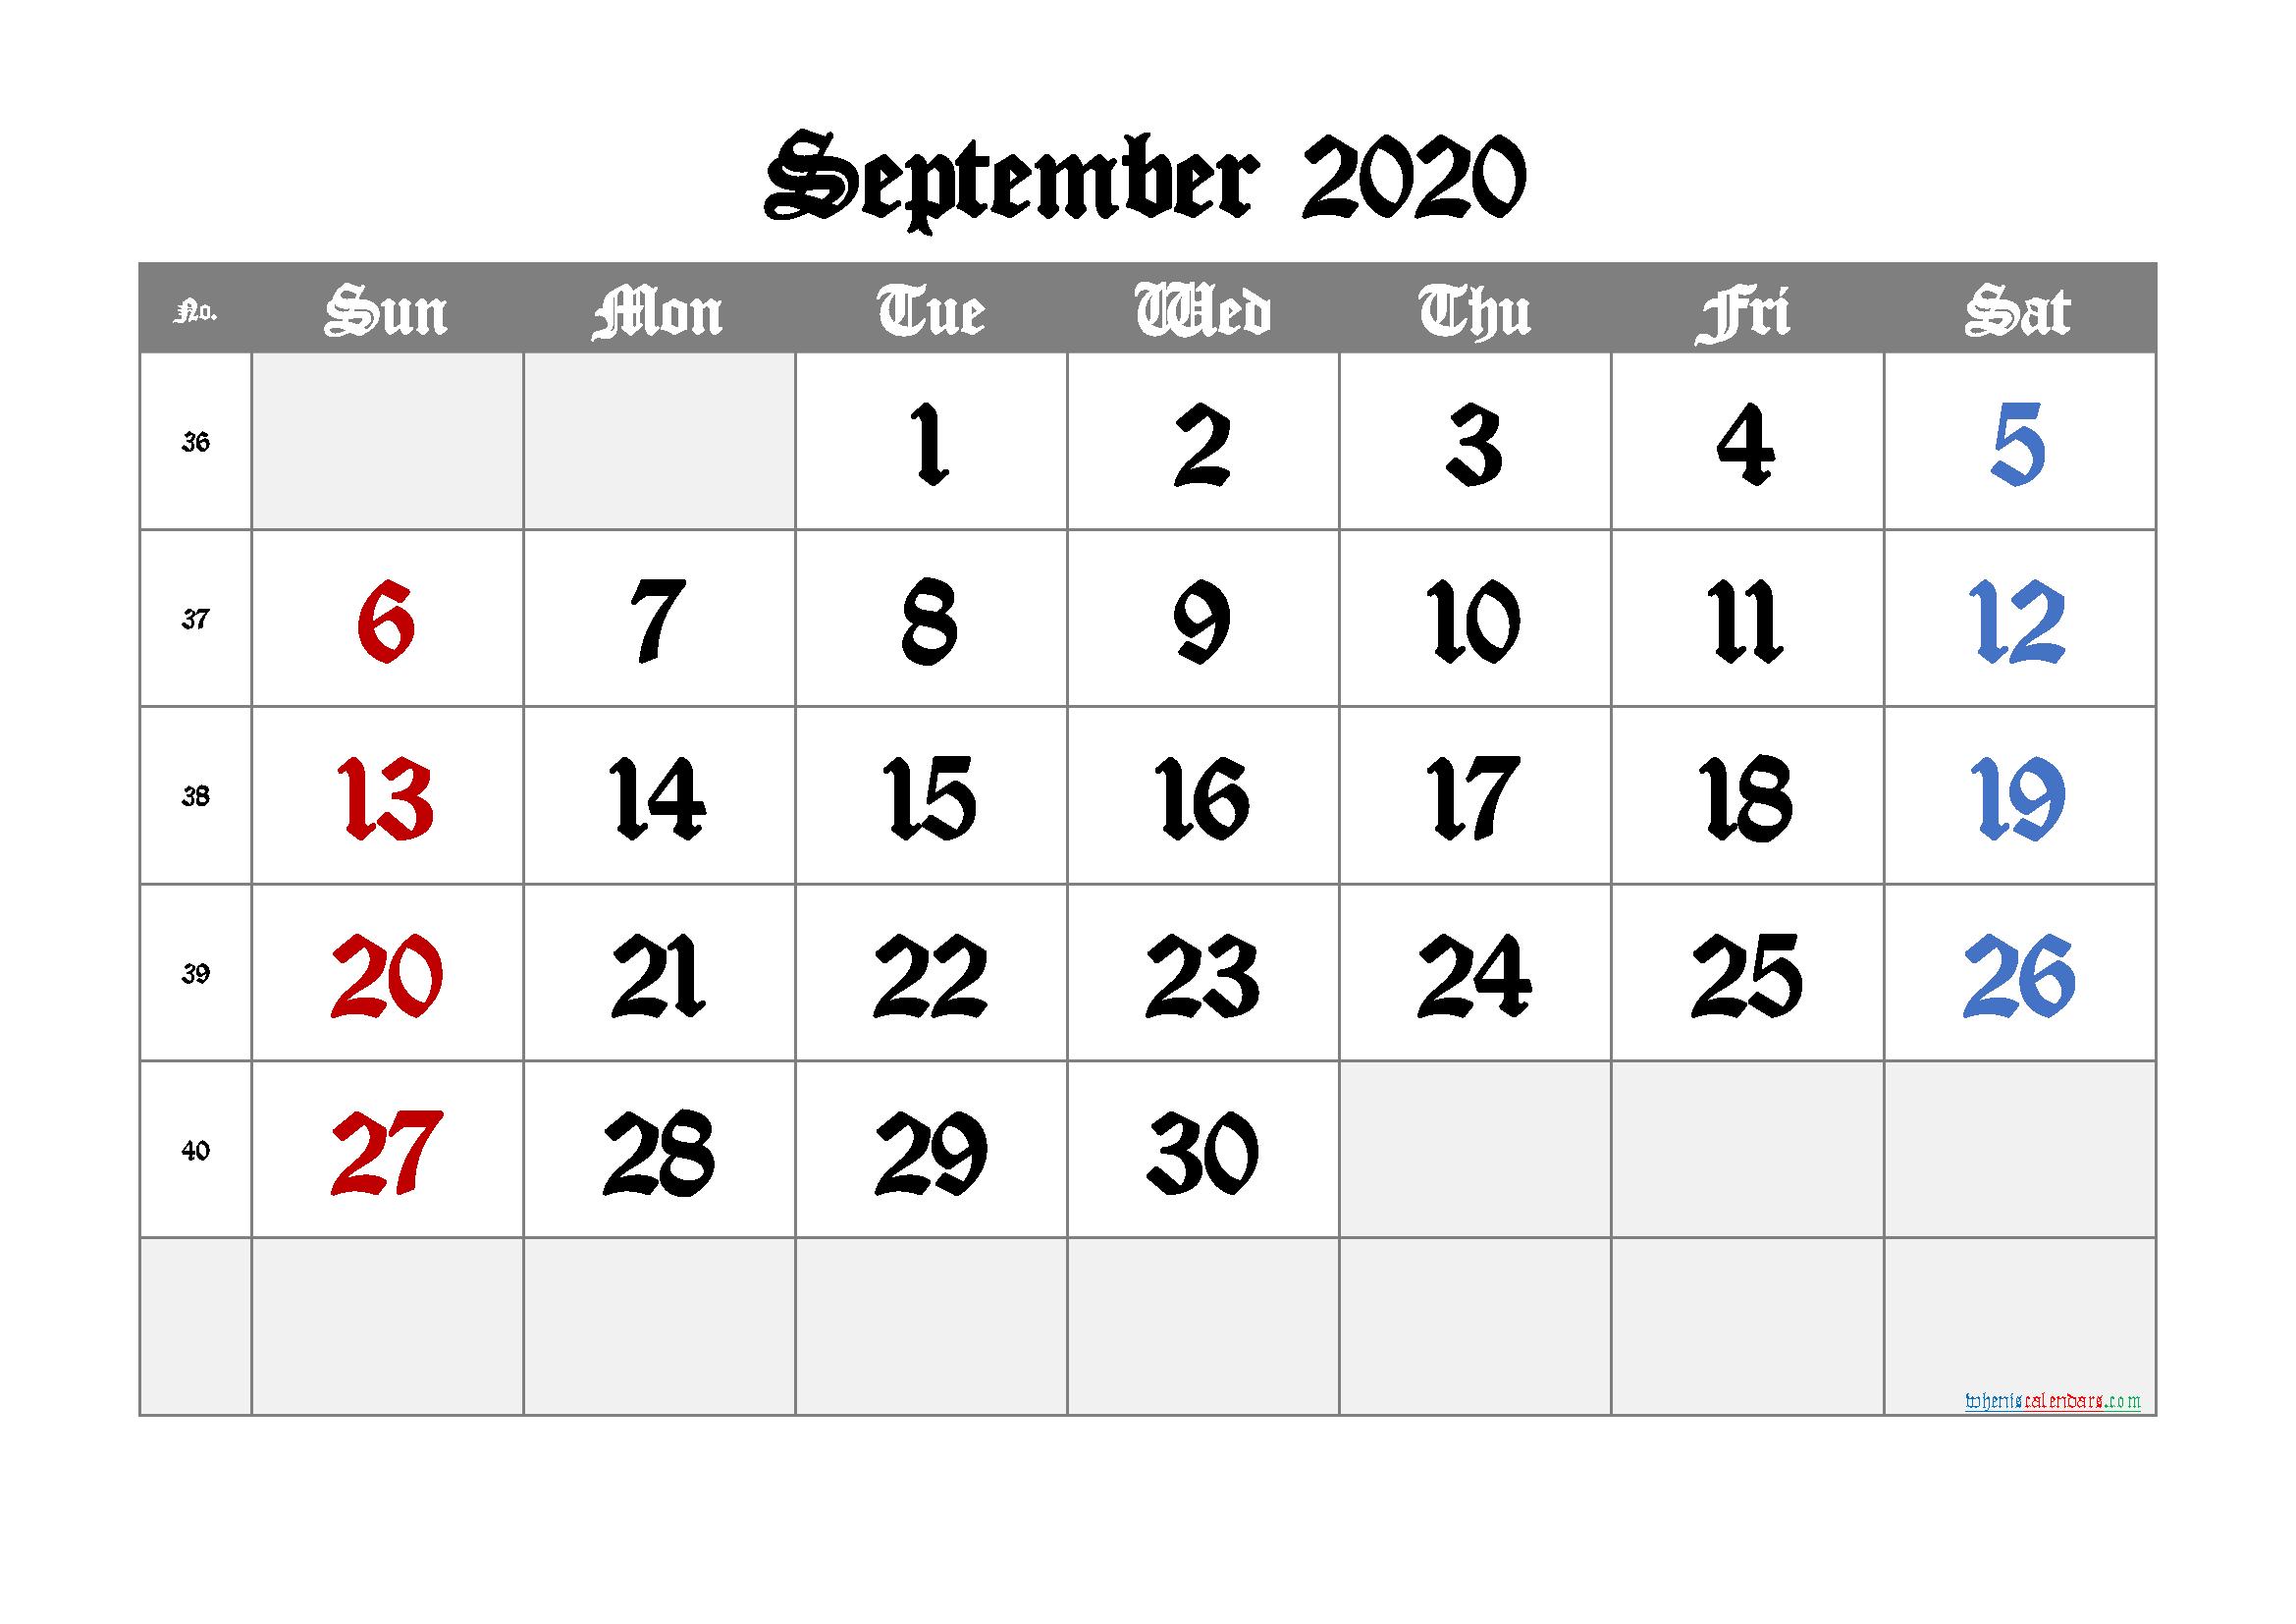 Free Printable Calendar 2020 September Free Printable 2020 Monthly Calendar With Holidays